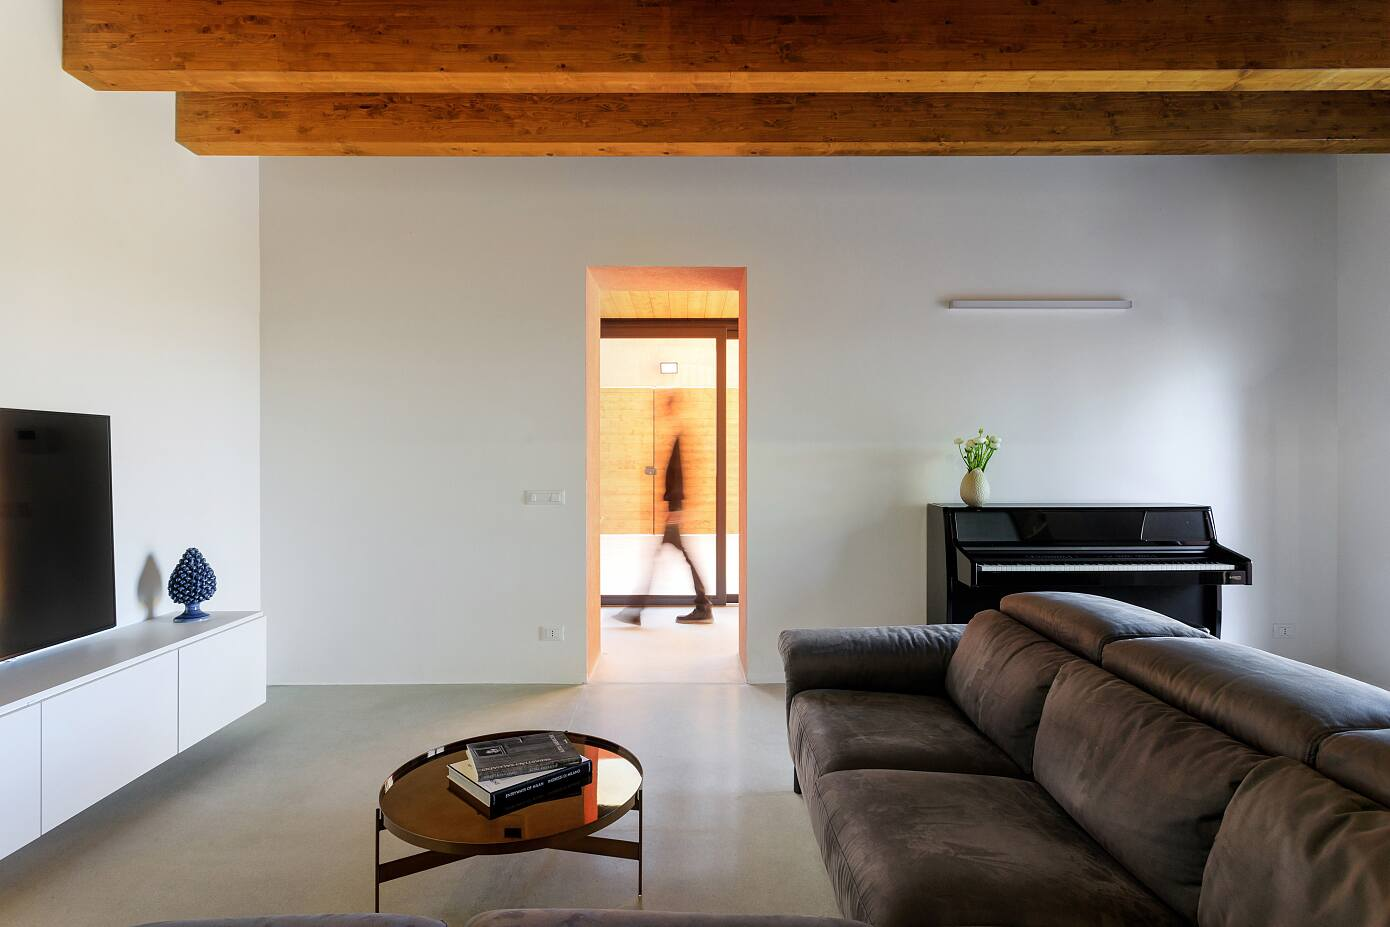 Casa Fevi by Salvatore Oddo